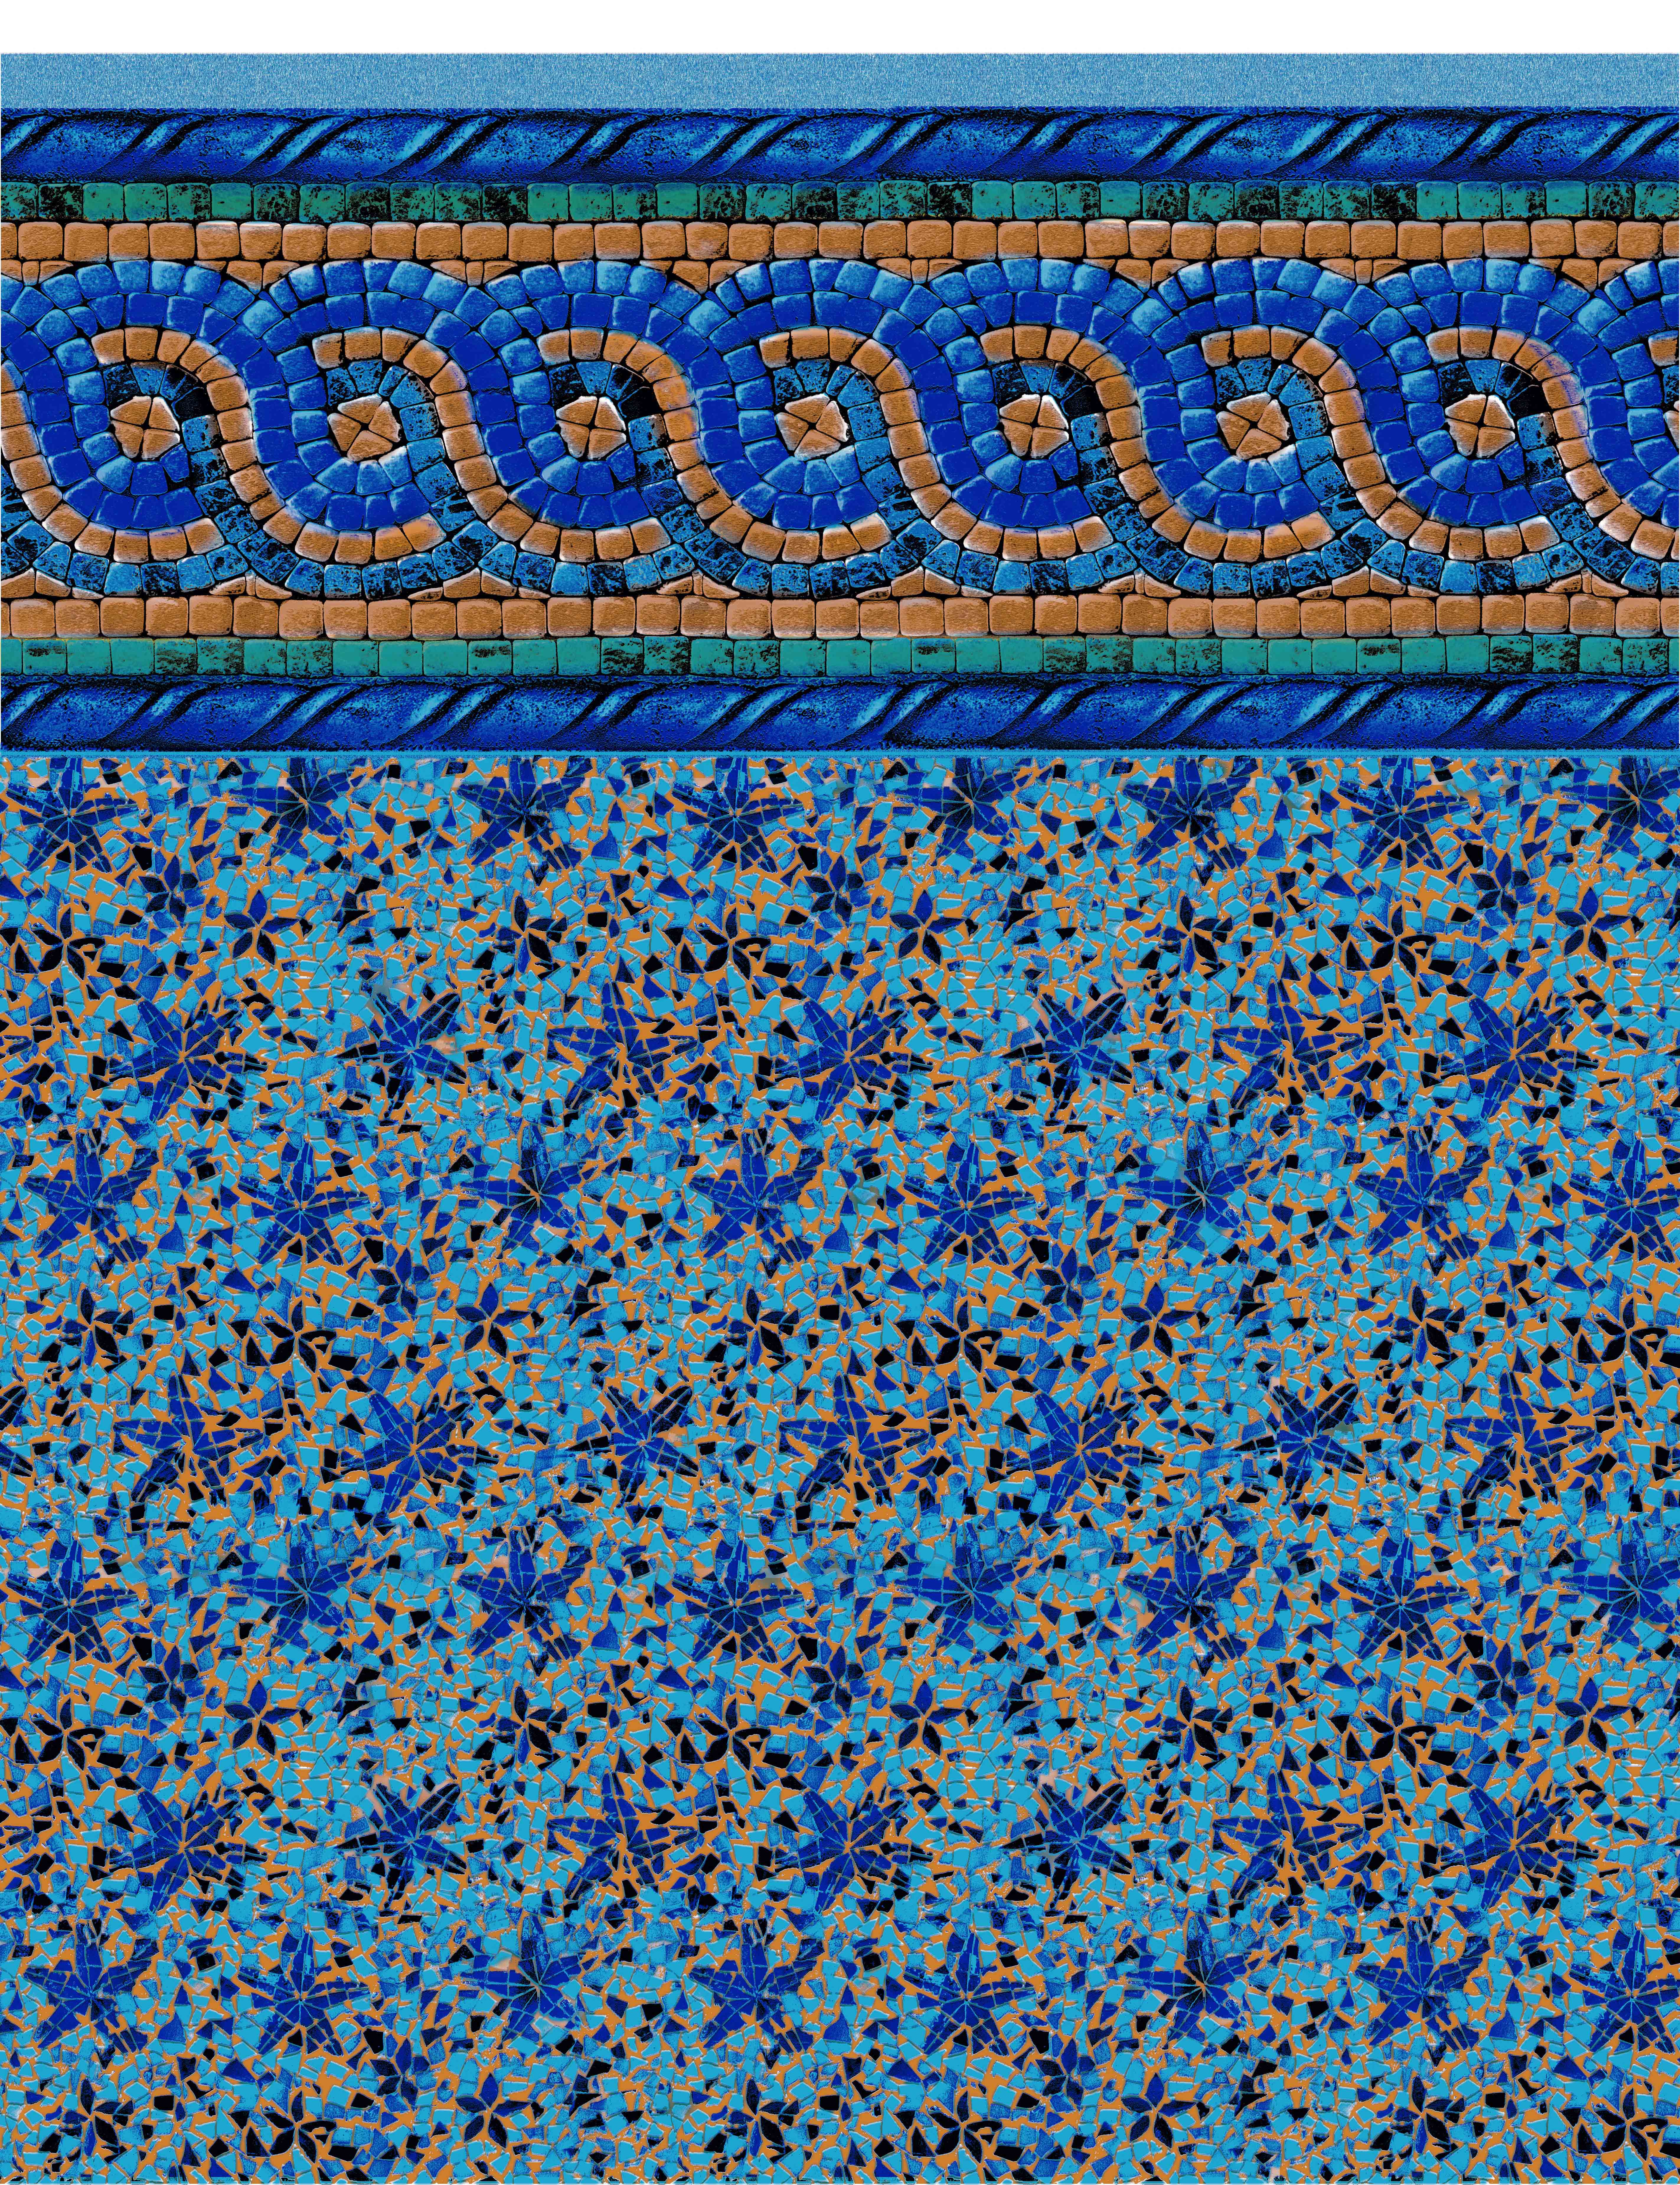 Mosaic Tile with Starfish Bottom